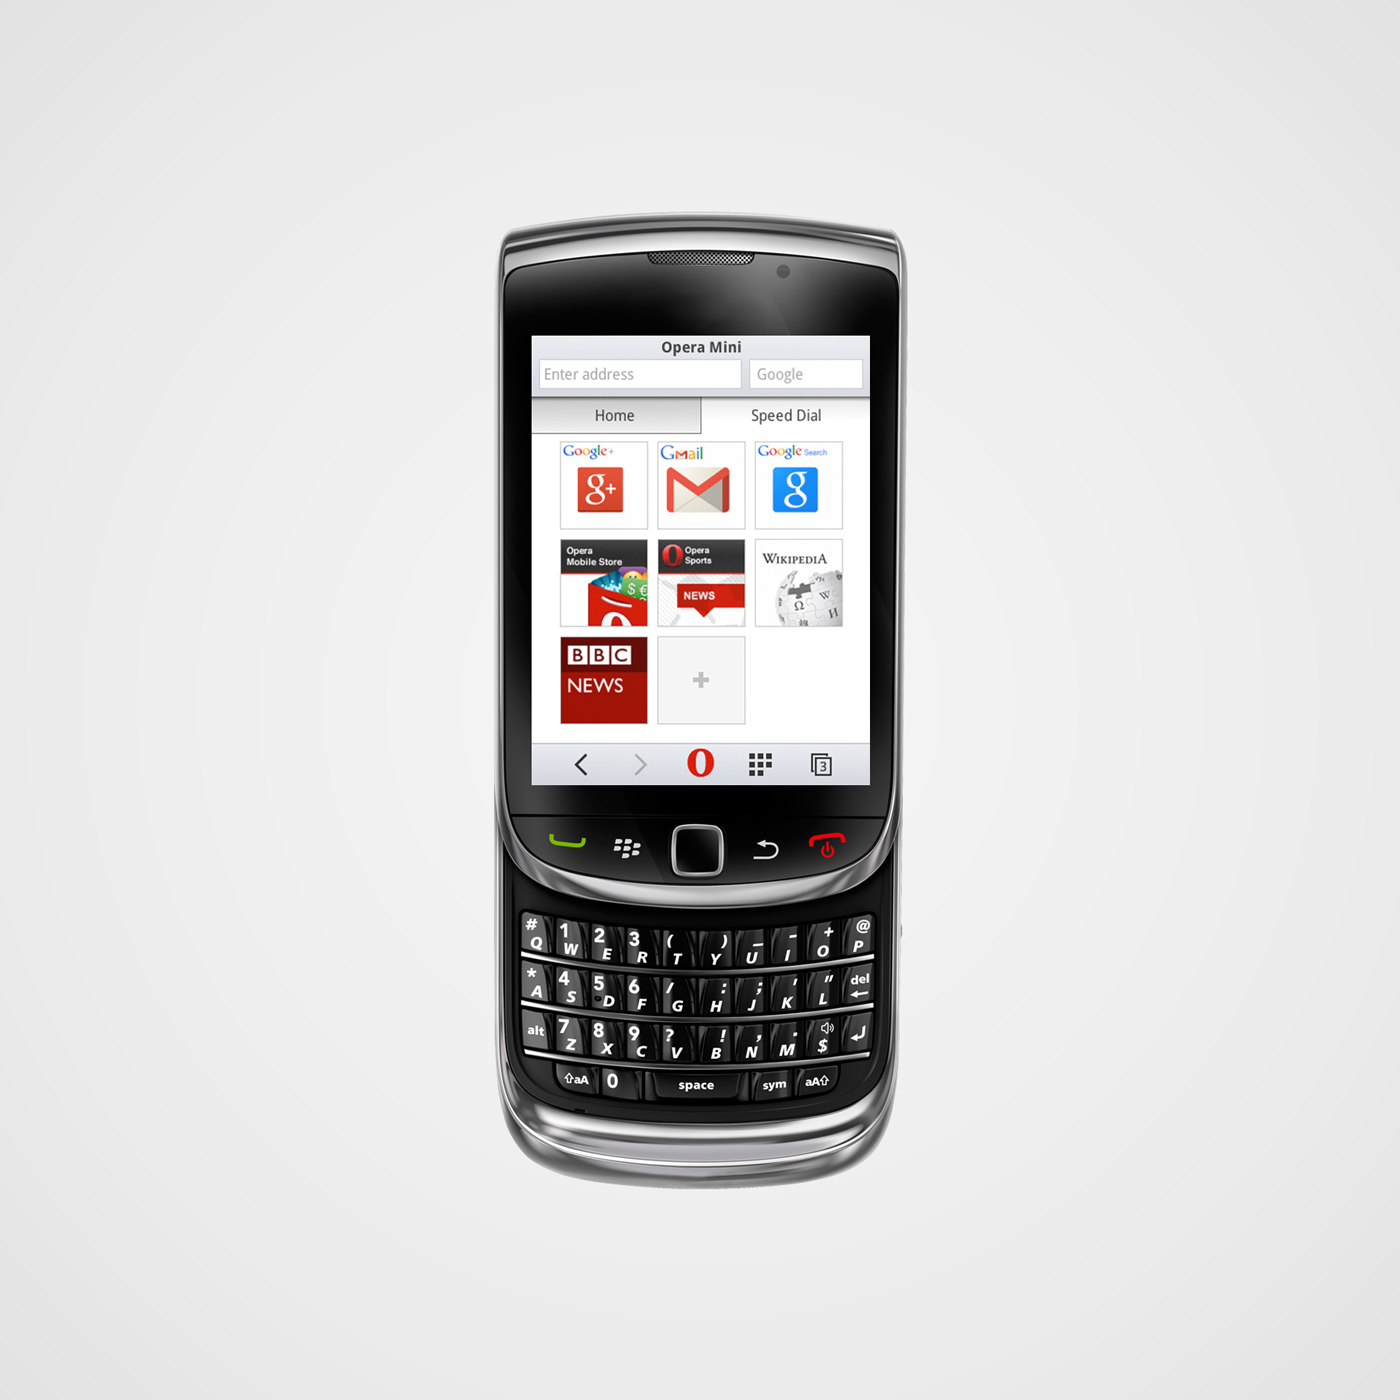 Opera_mini_8screenshotgspeed_dial